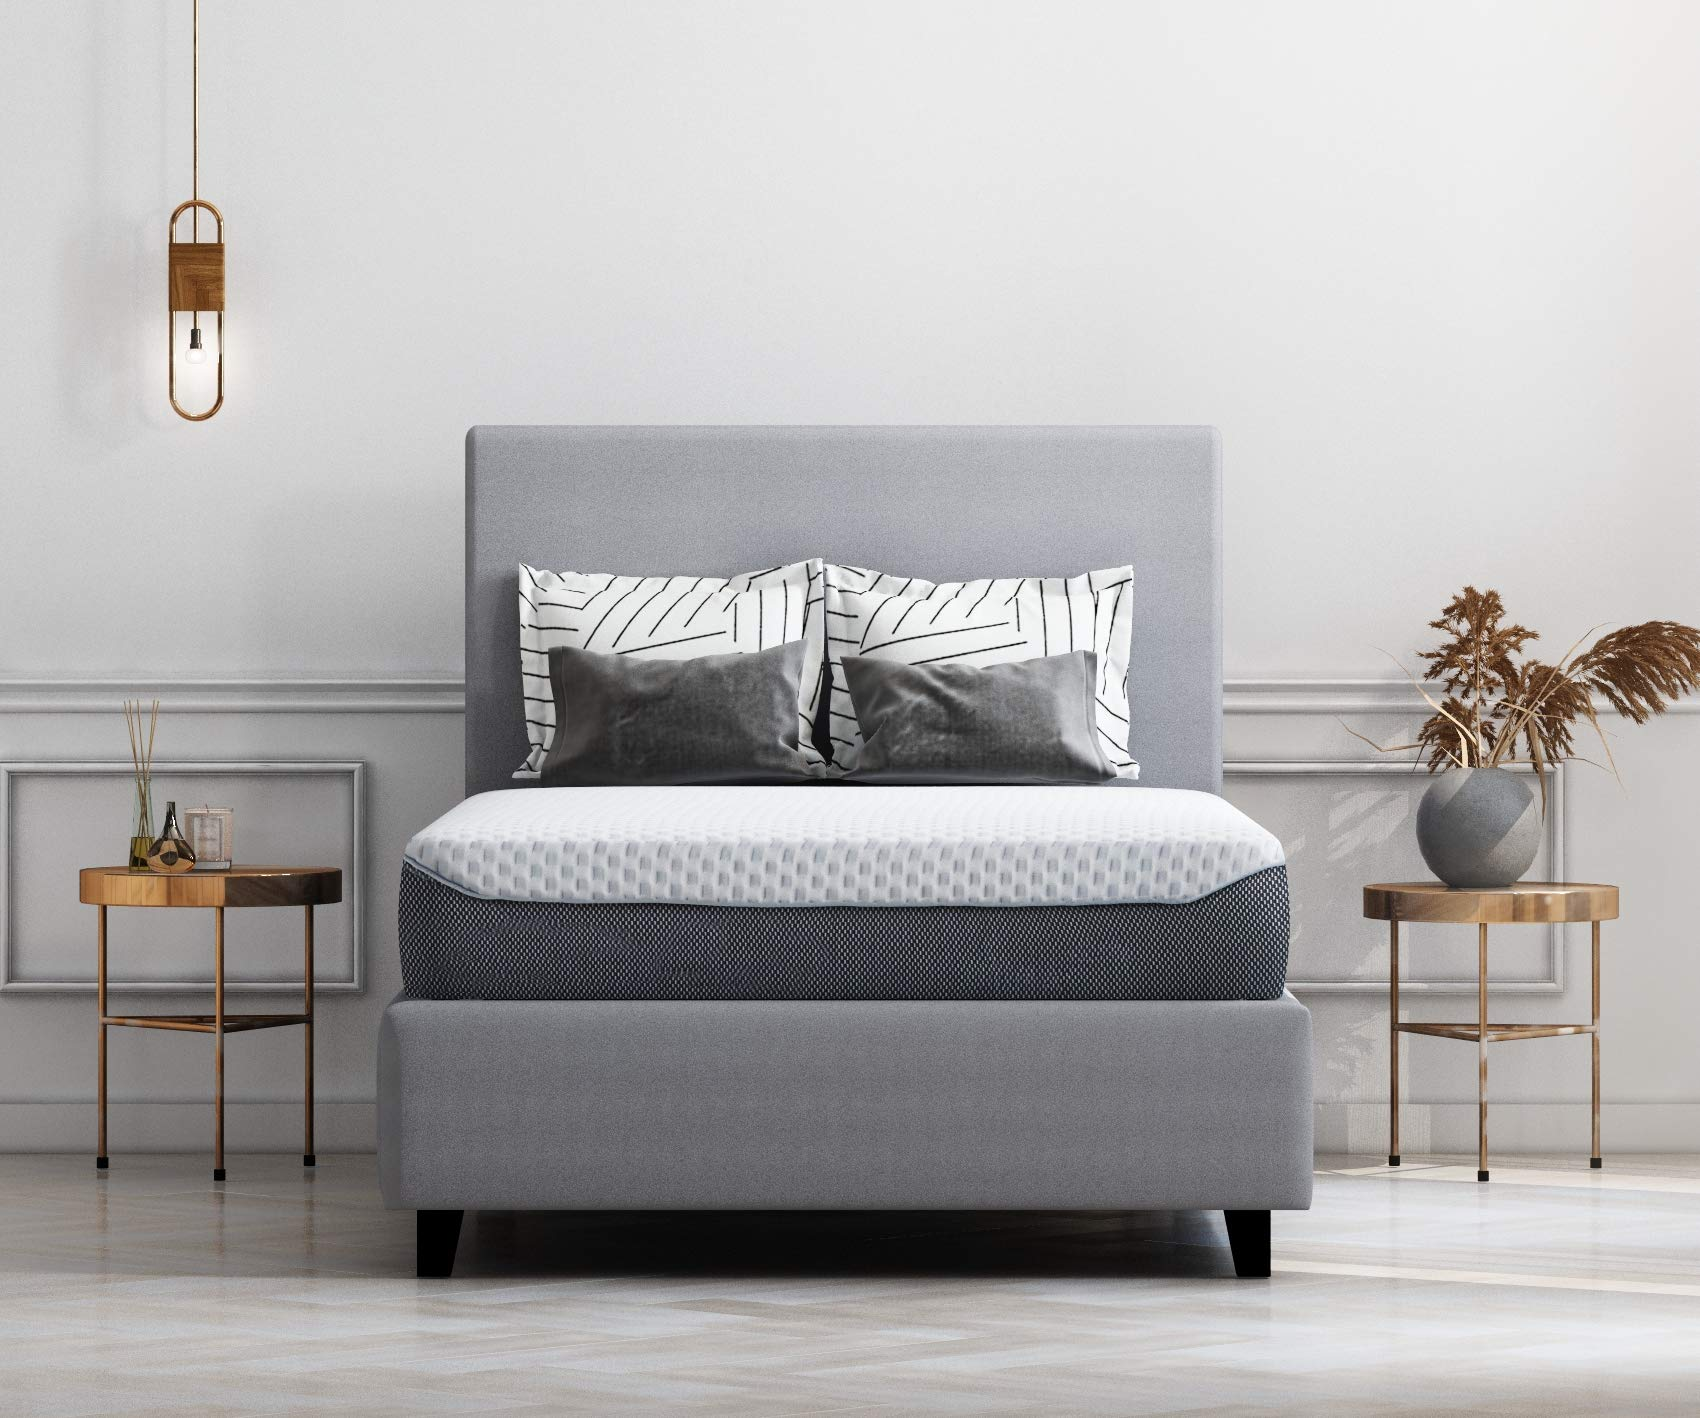 Ashley Furniture Signature Design - 10 Inch Chime Elite Mattress - Full Size - White & Blue